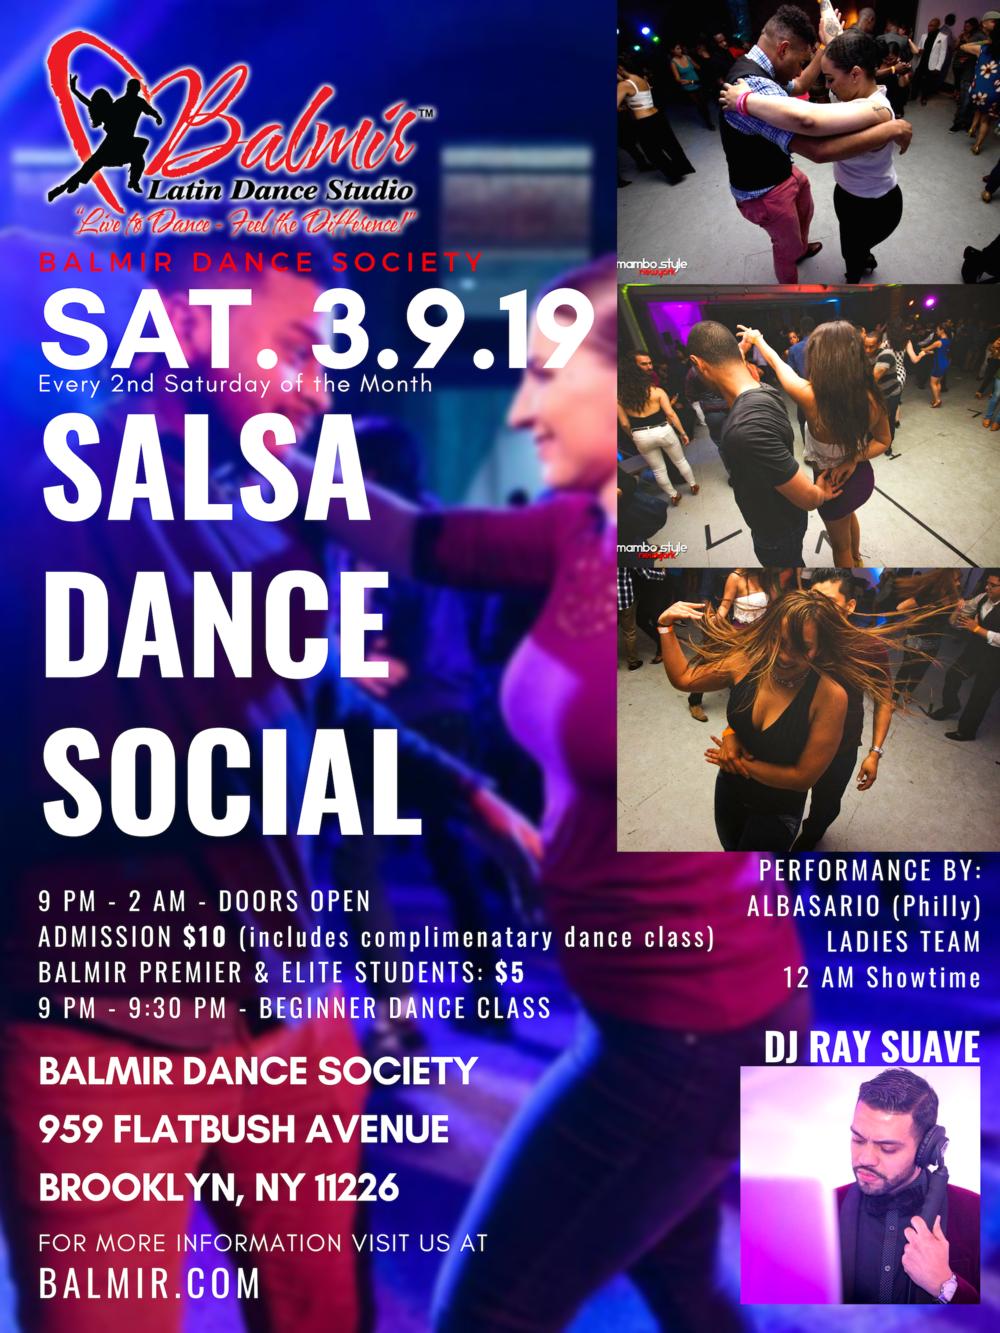 SALSA DANCE SOCIAL PARTY BROOKLYN NEW YORK CITY EVENTS FUN DANCE CLUB.png